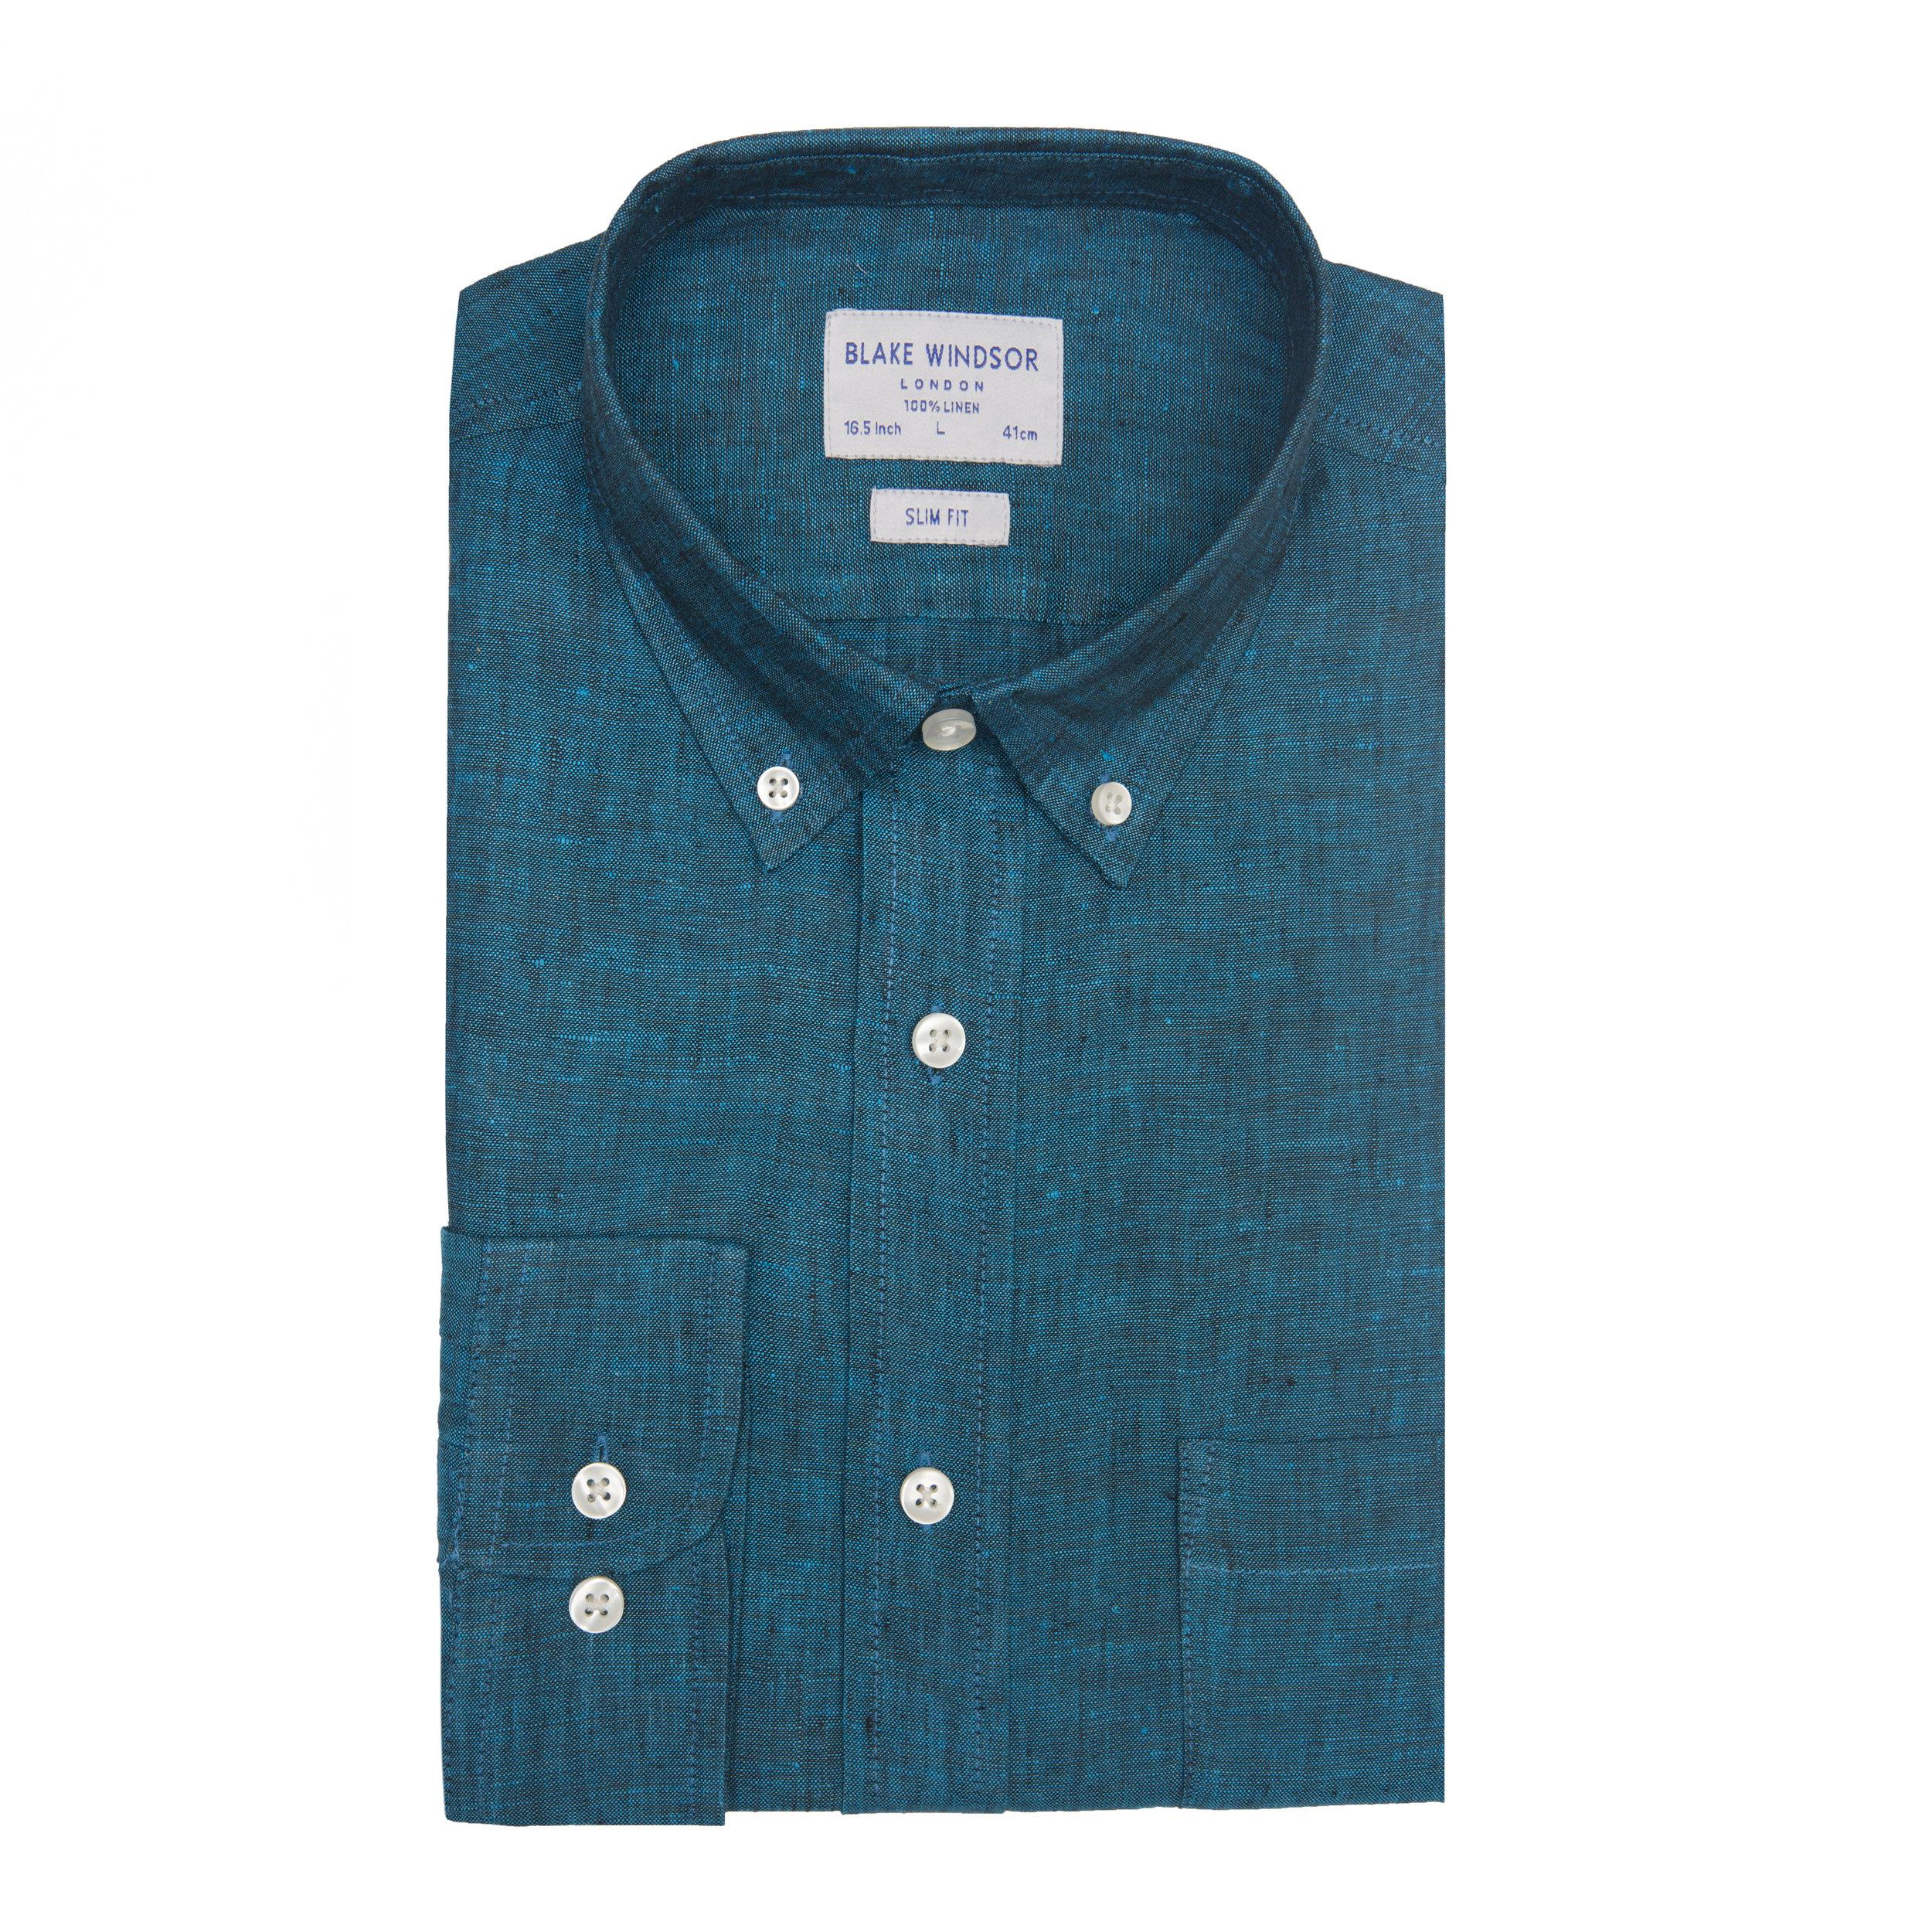 shirt-square-web.jpg